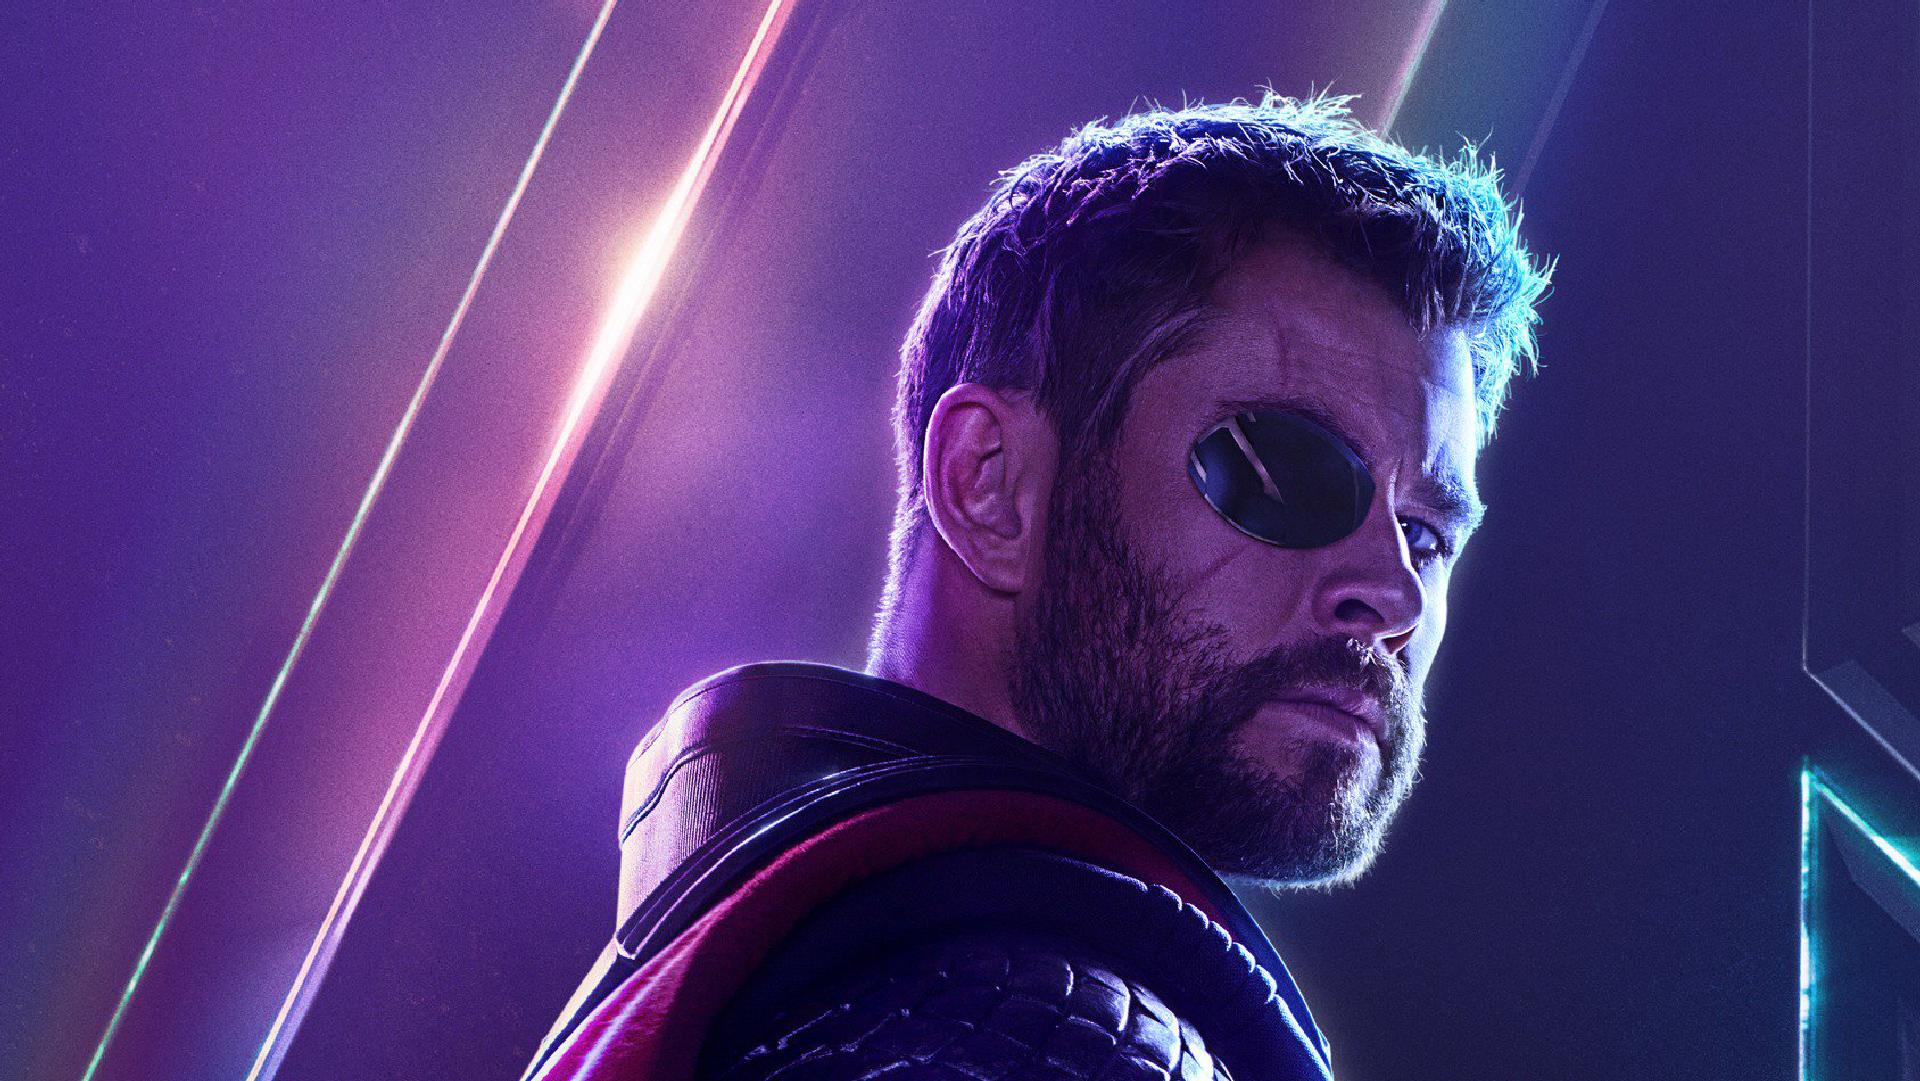 3840x2400 Thor In Avengers Infinity War New Poster 4k Hd 4k